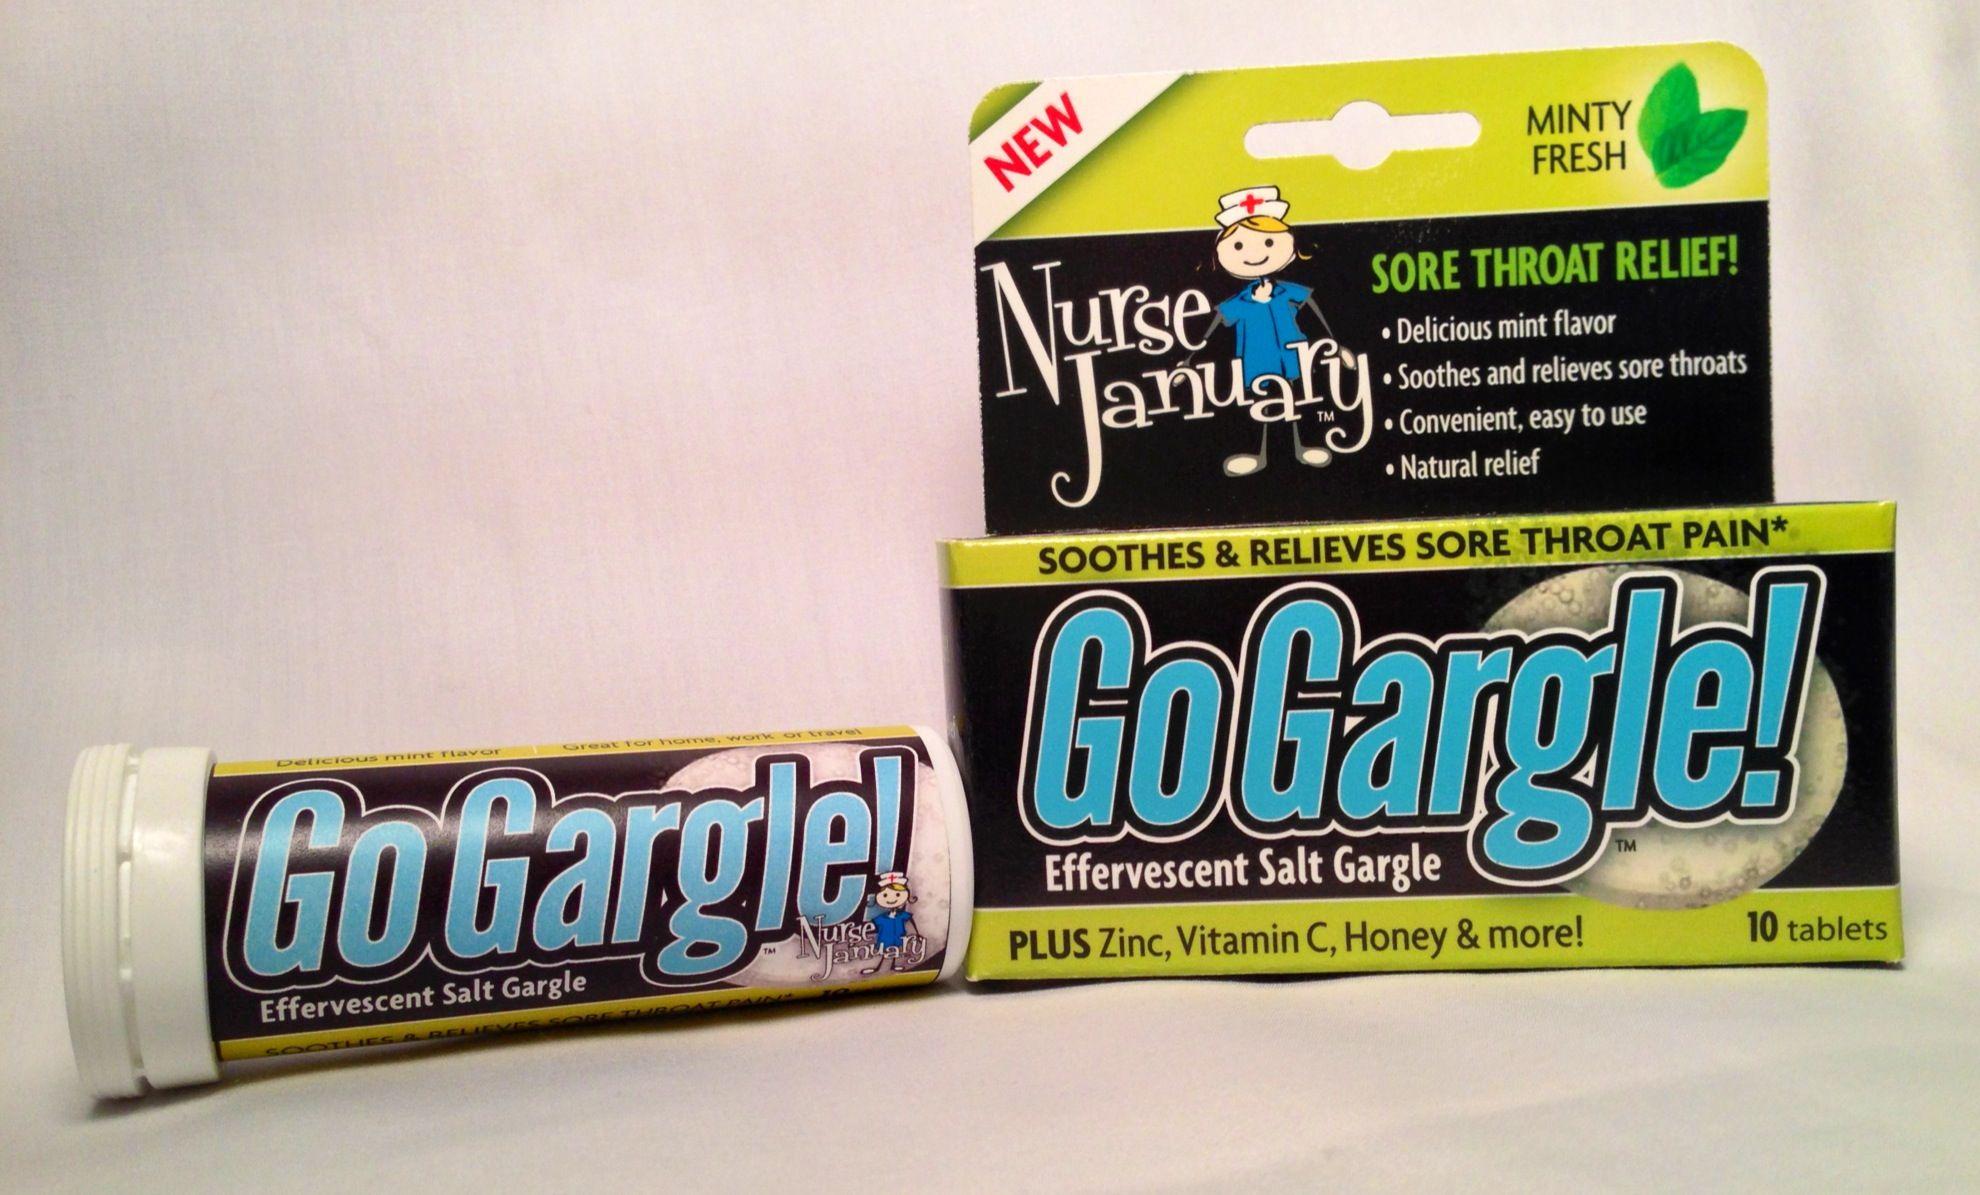 Gogargle Is An All Natural Salt Based Effervescent Gargle For Sore